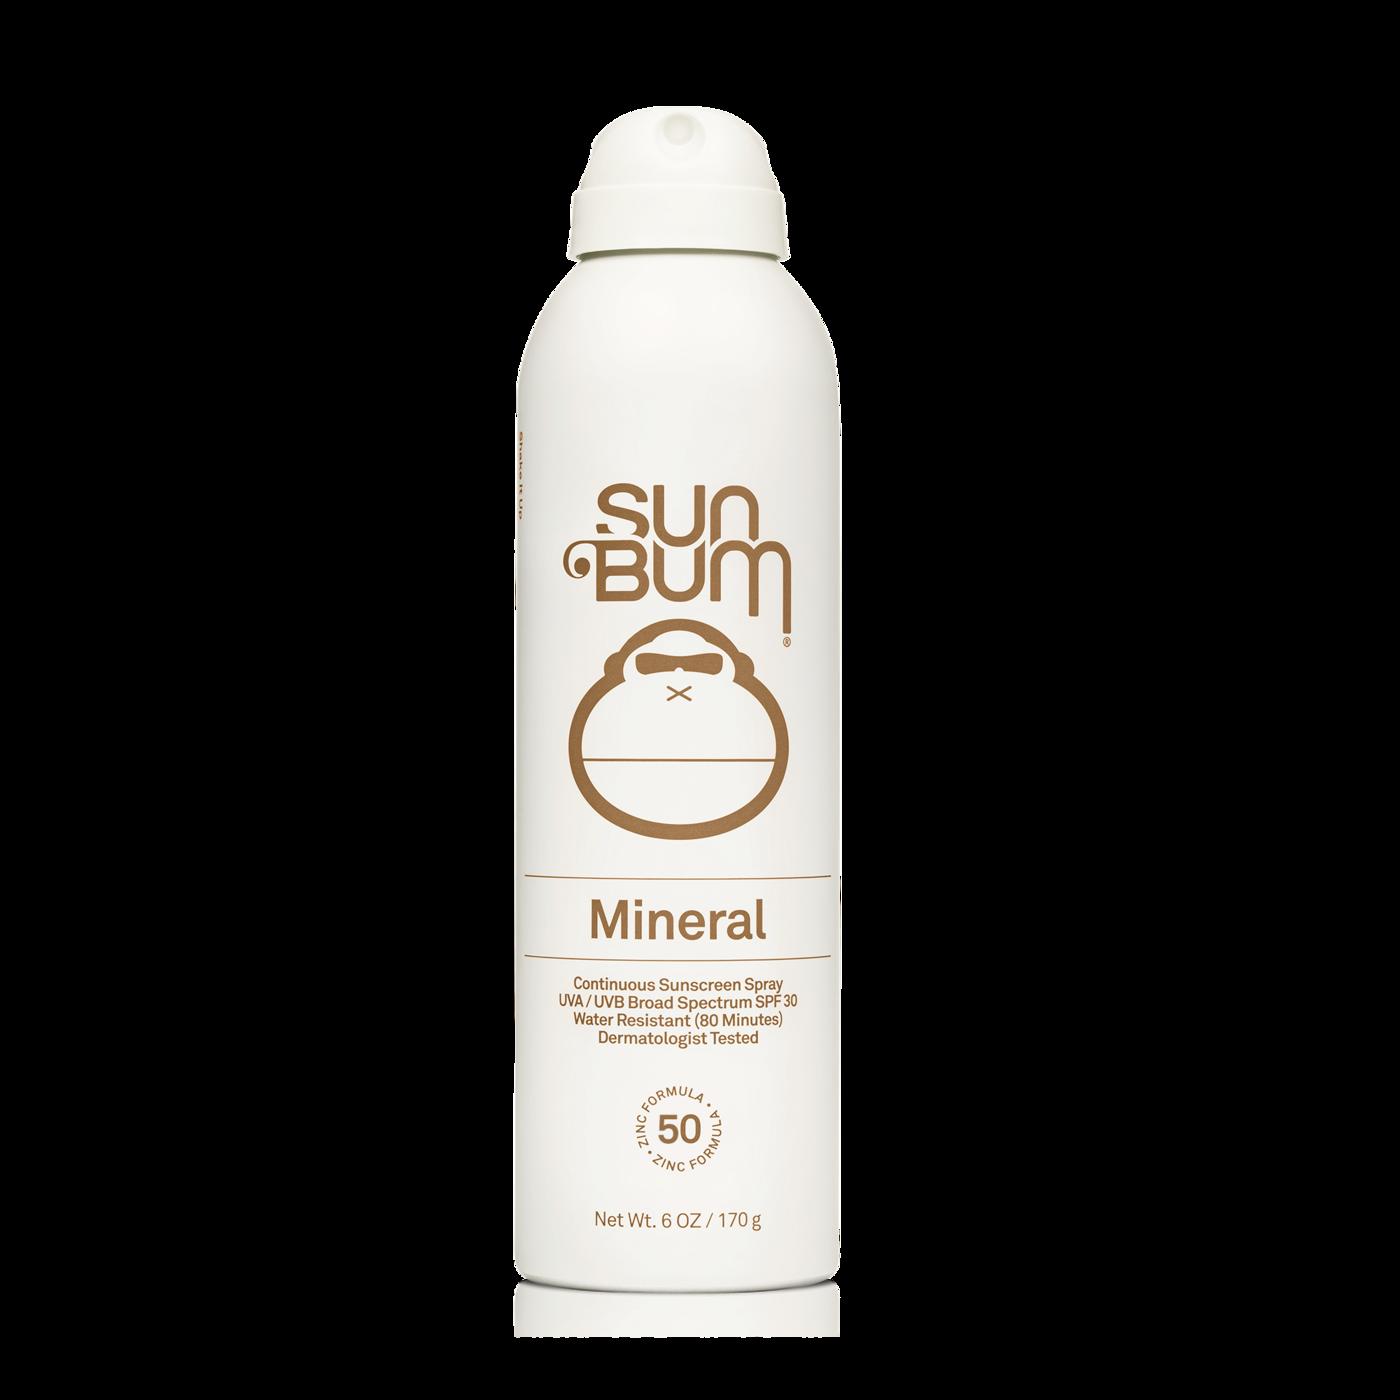 Sun Bum® - Mineral SPF 50 Sunscreen Spray